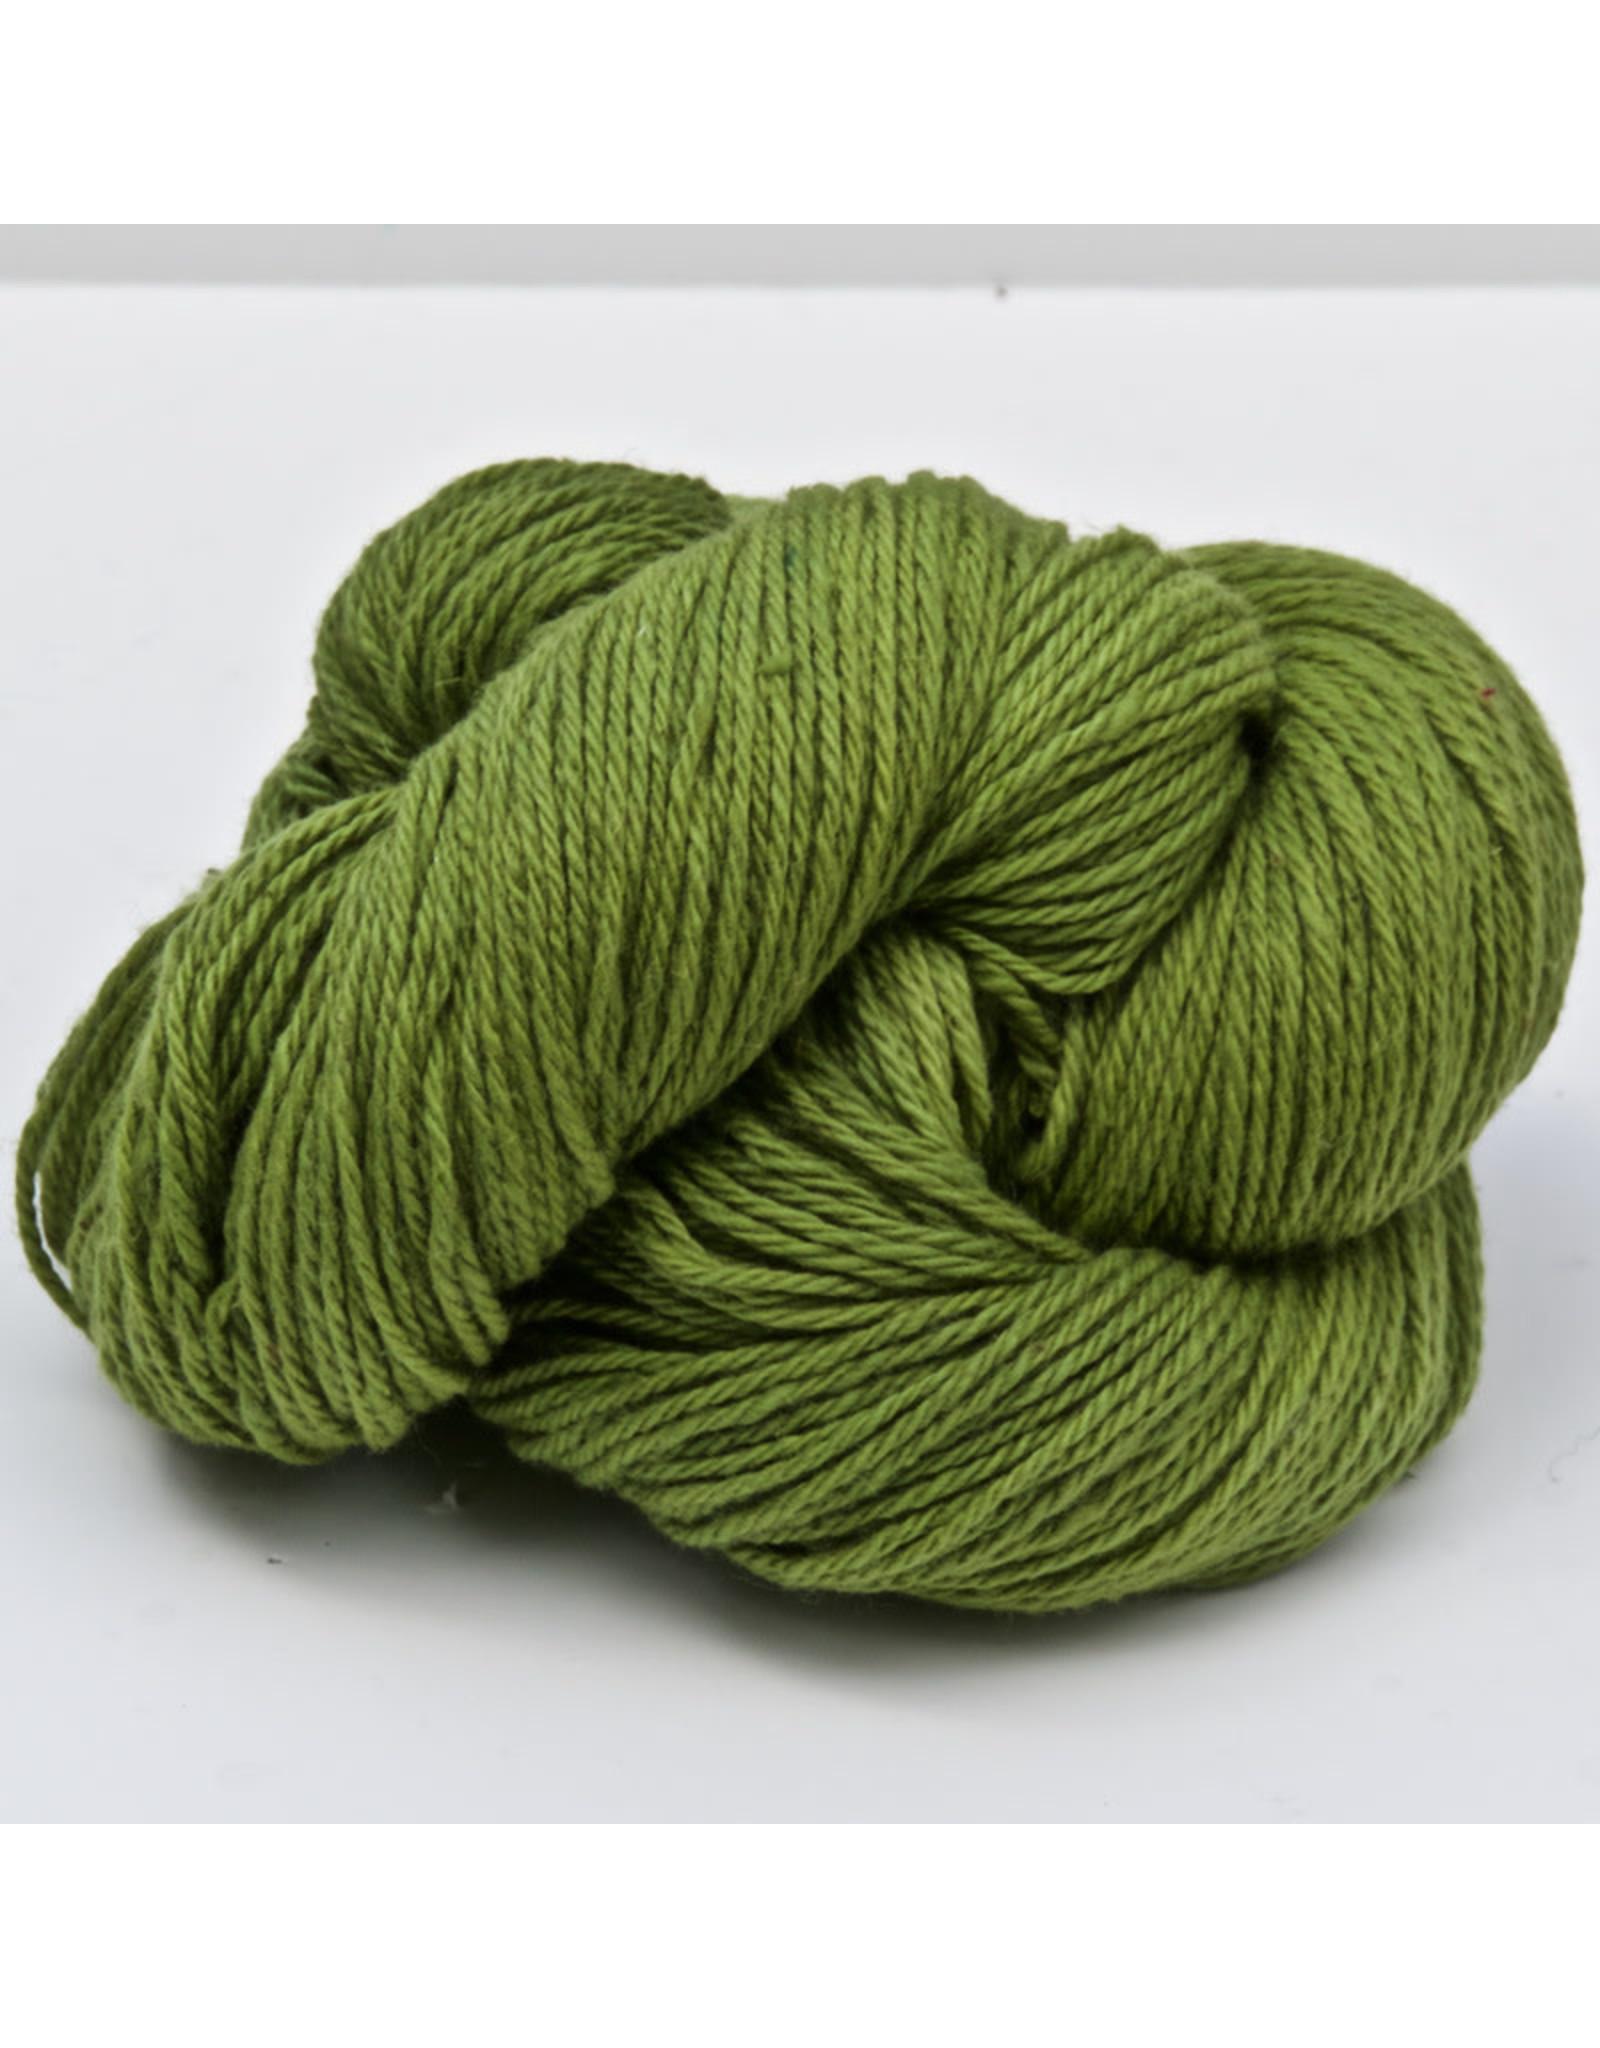 Cestari Sheep and Wool Cestari: Monticello (Cools),